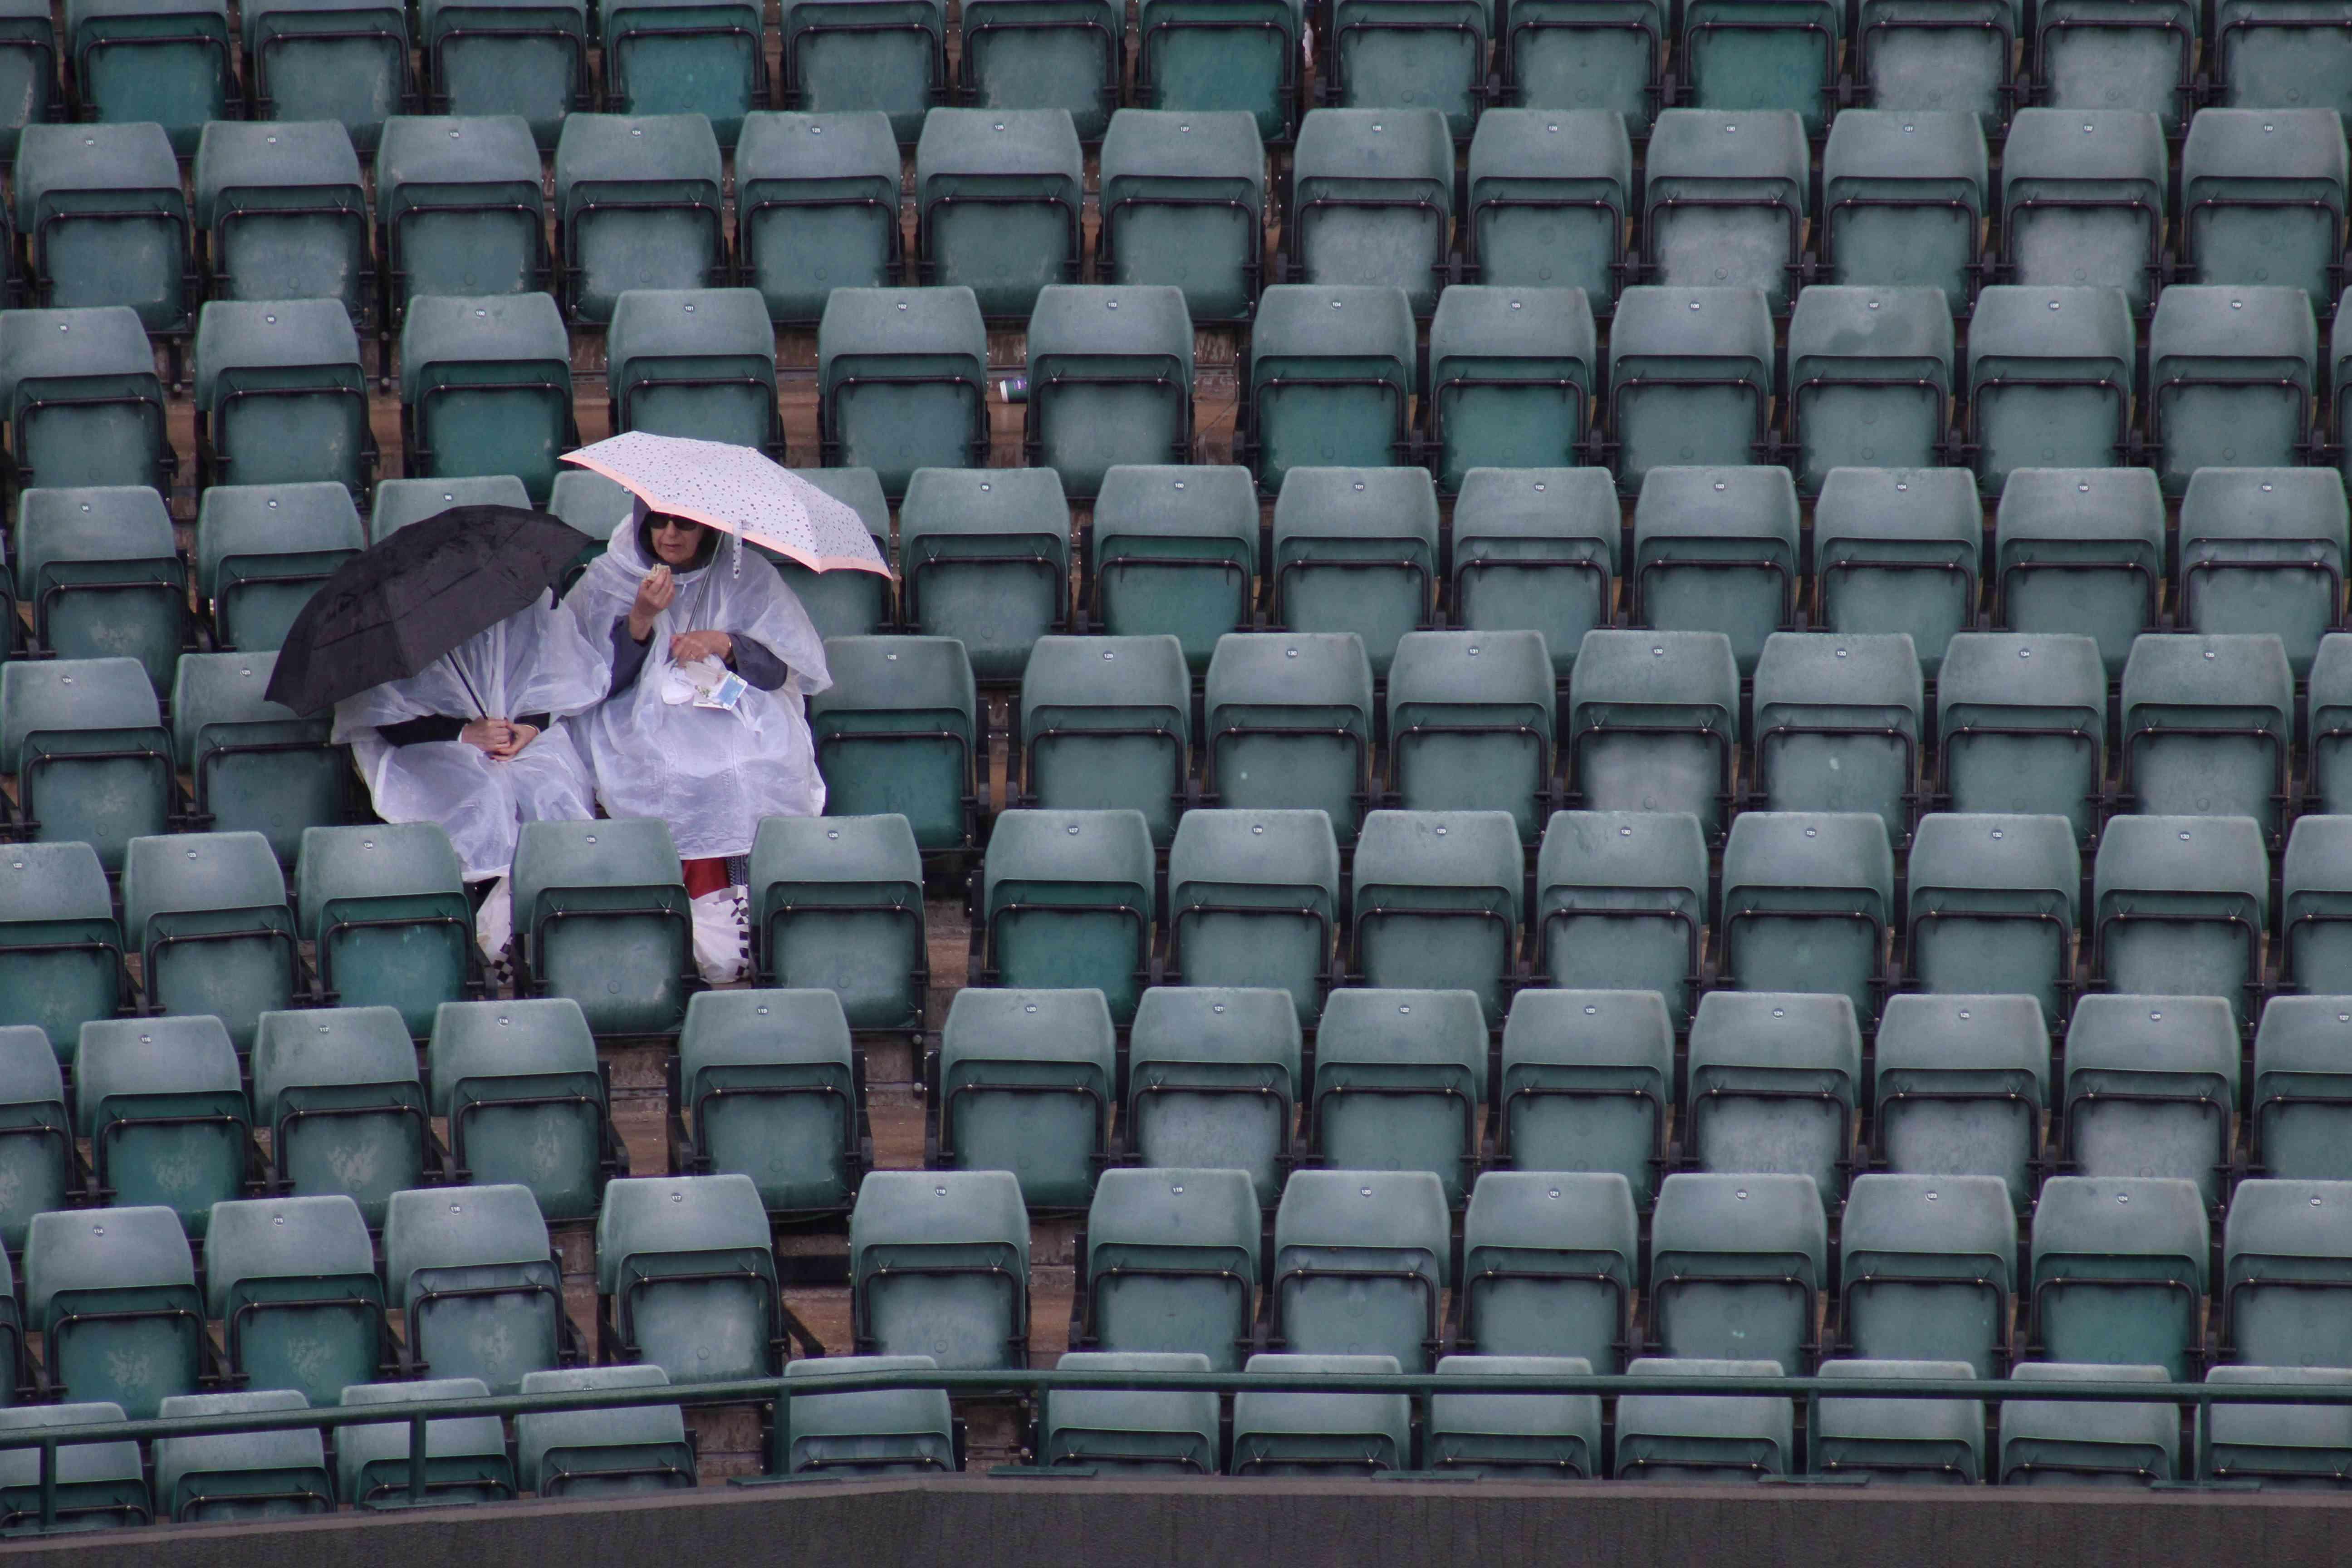 Wimbledon 2 ladies sitting with brollies